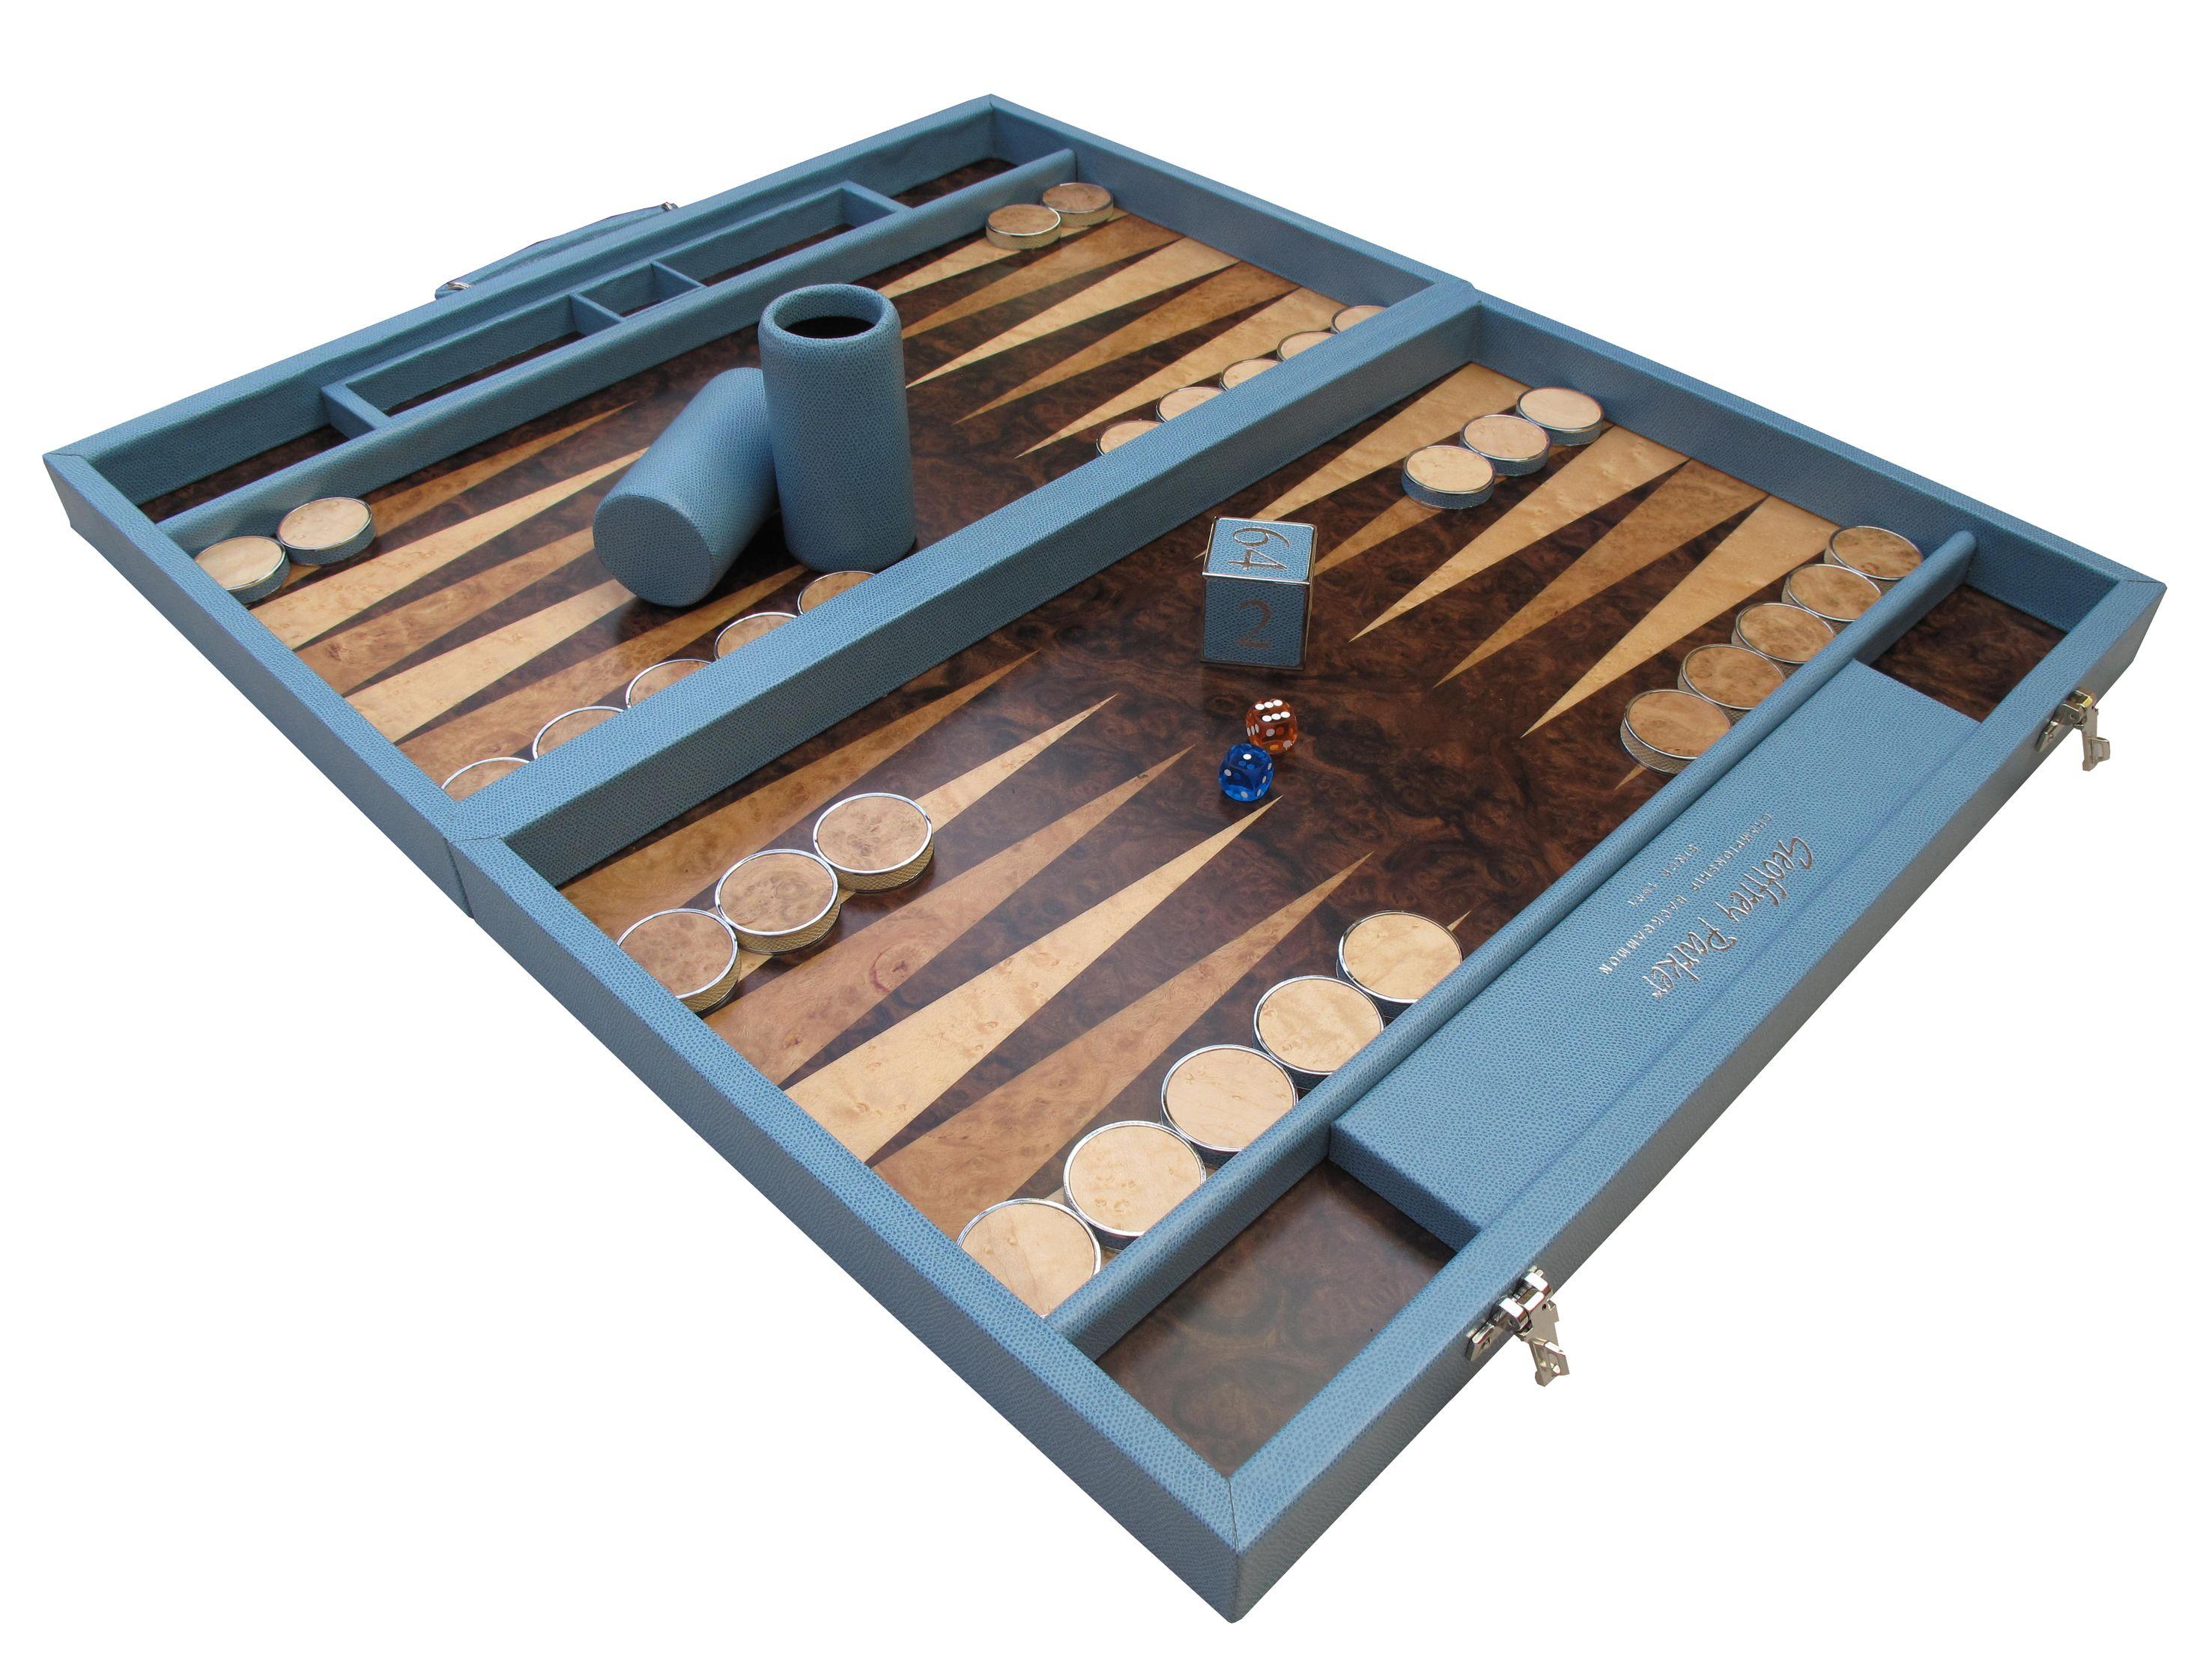 Sky Blue and Mediterranean Floor Backgammon #Gift #Game #Luxury #Backgammon #Contemporary